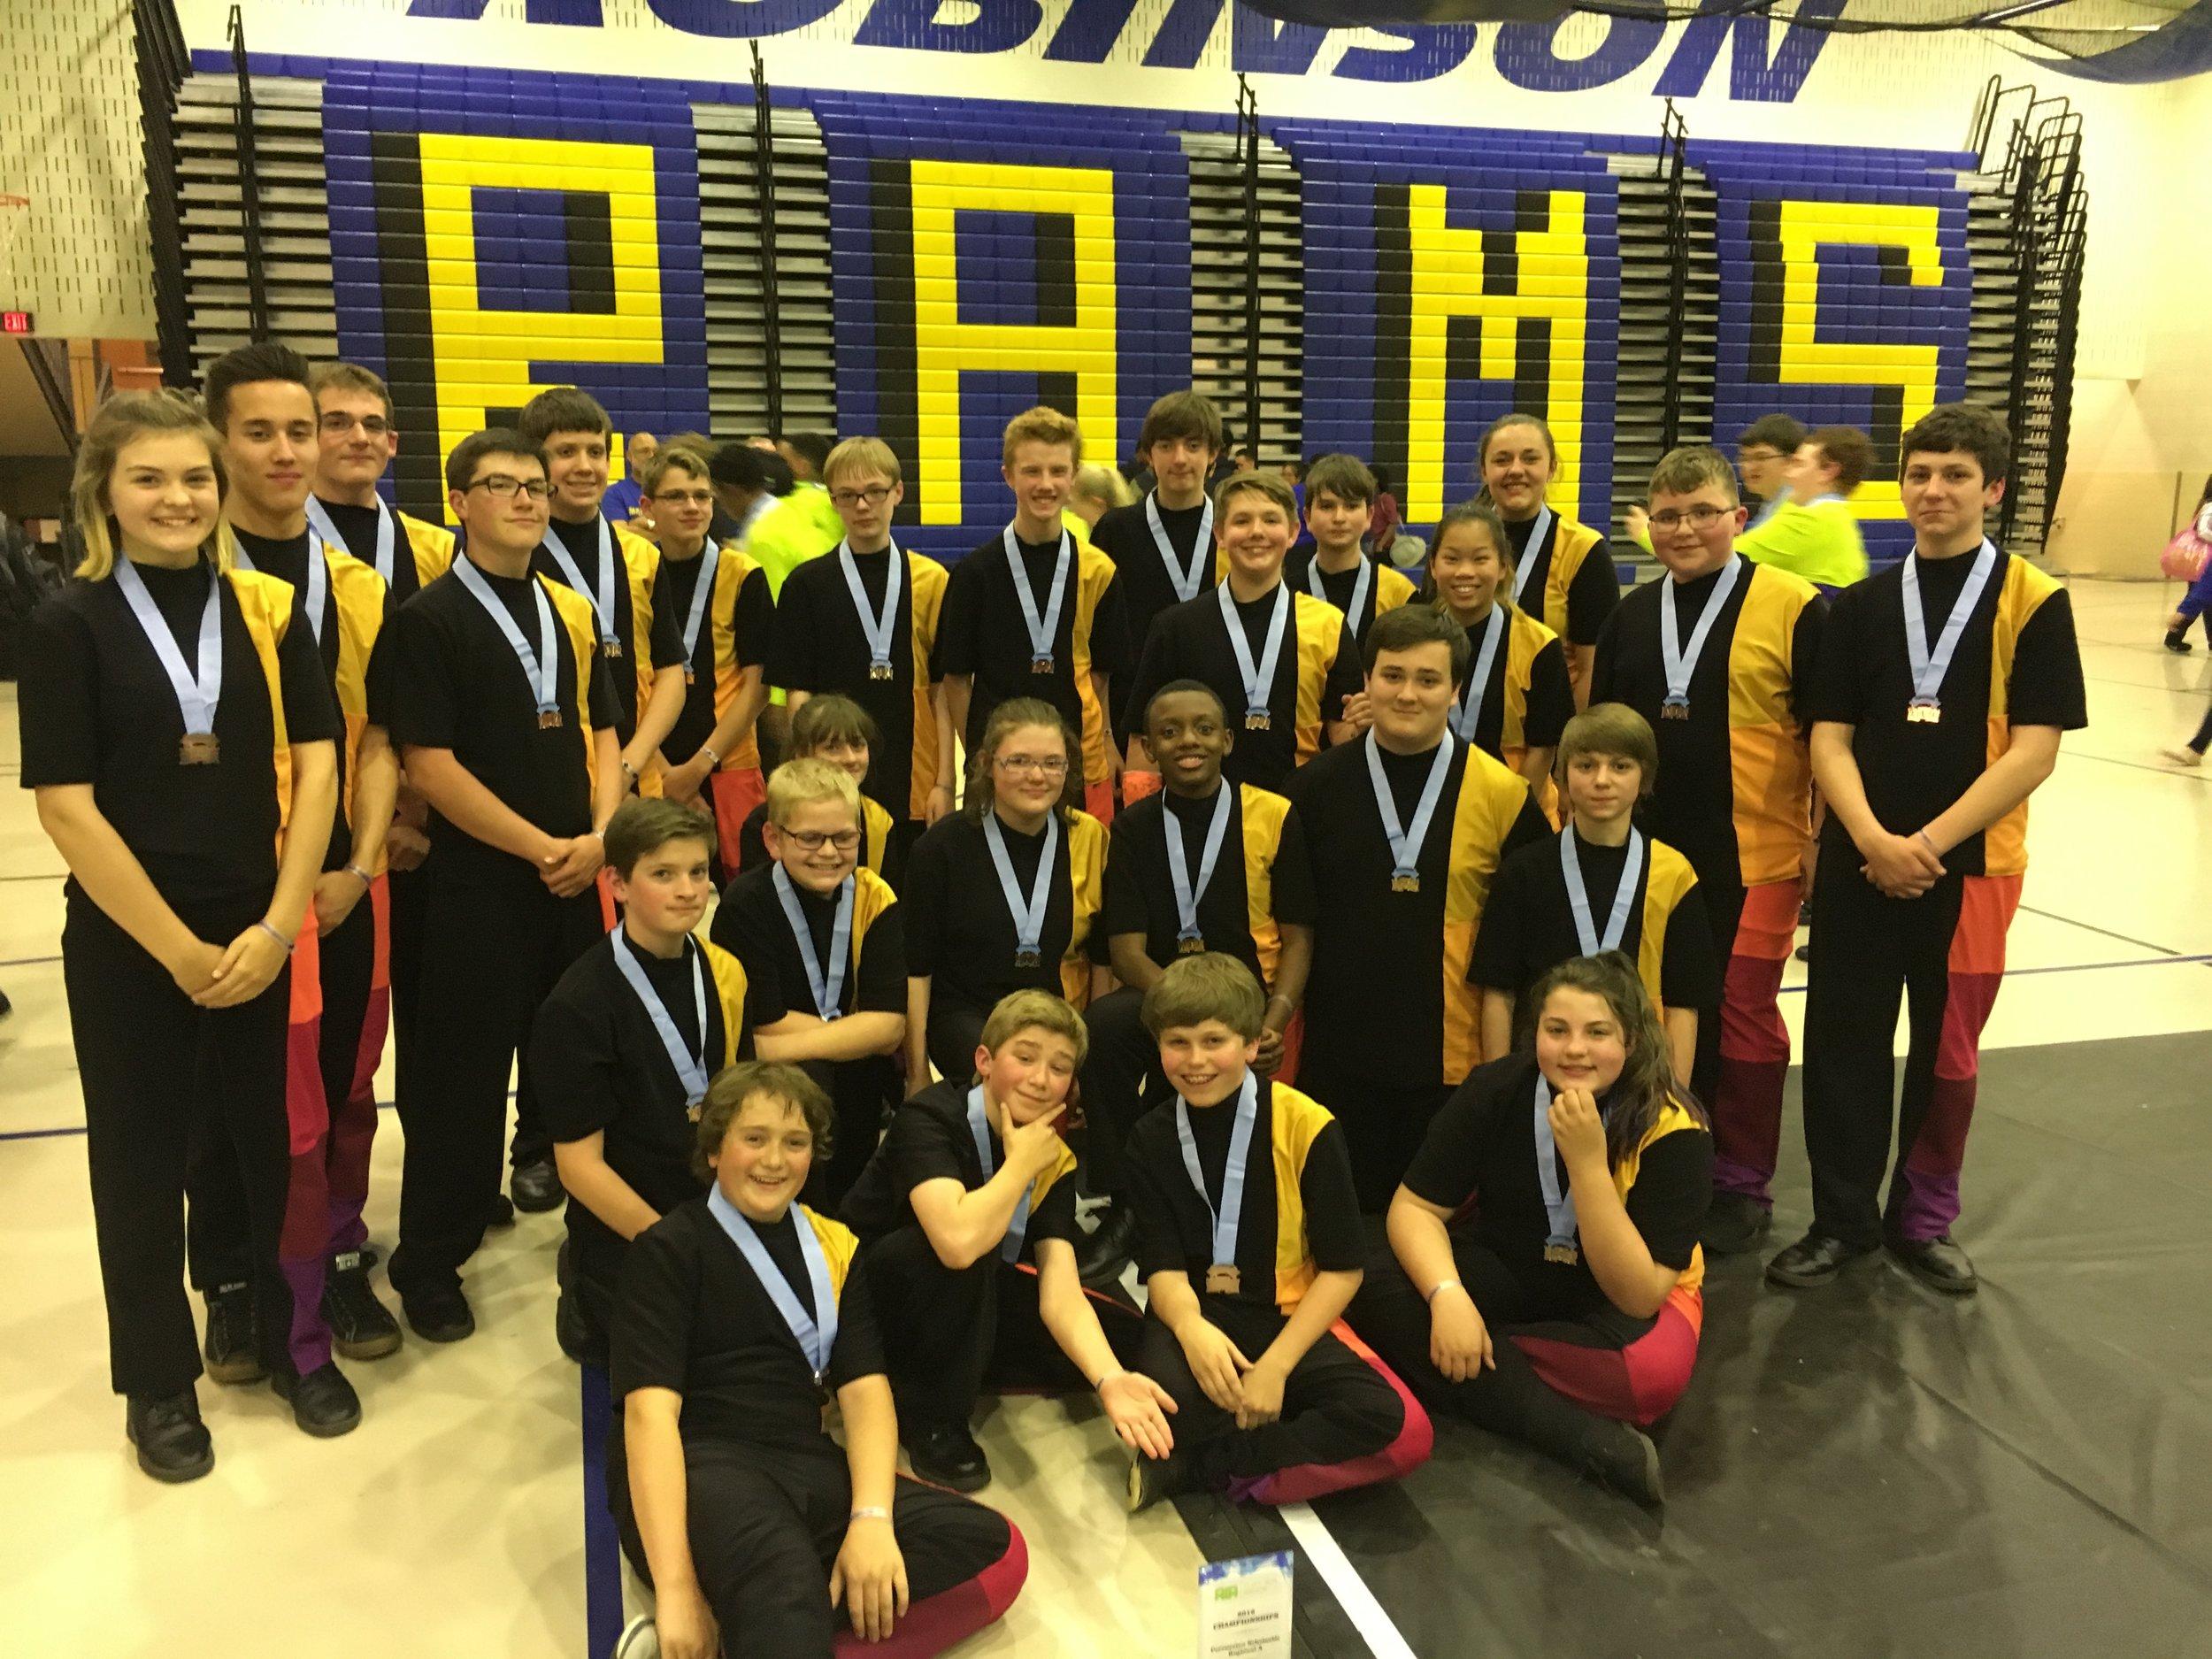 2016 AIA Scholastic A Bronze Medalist. Powhatan JV Percussion Ensemble